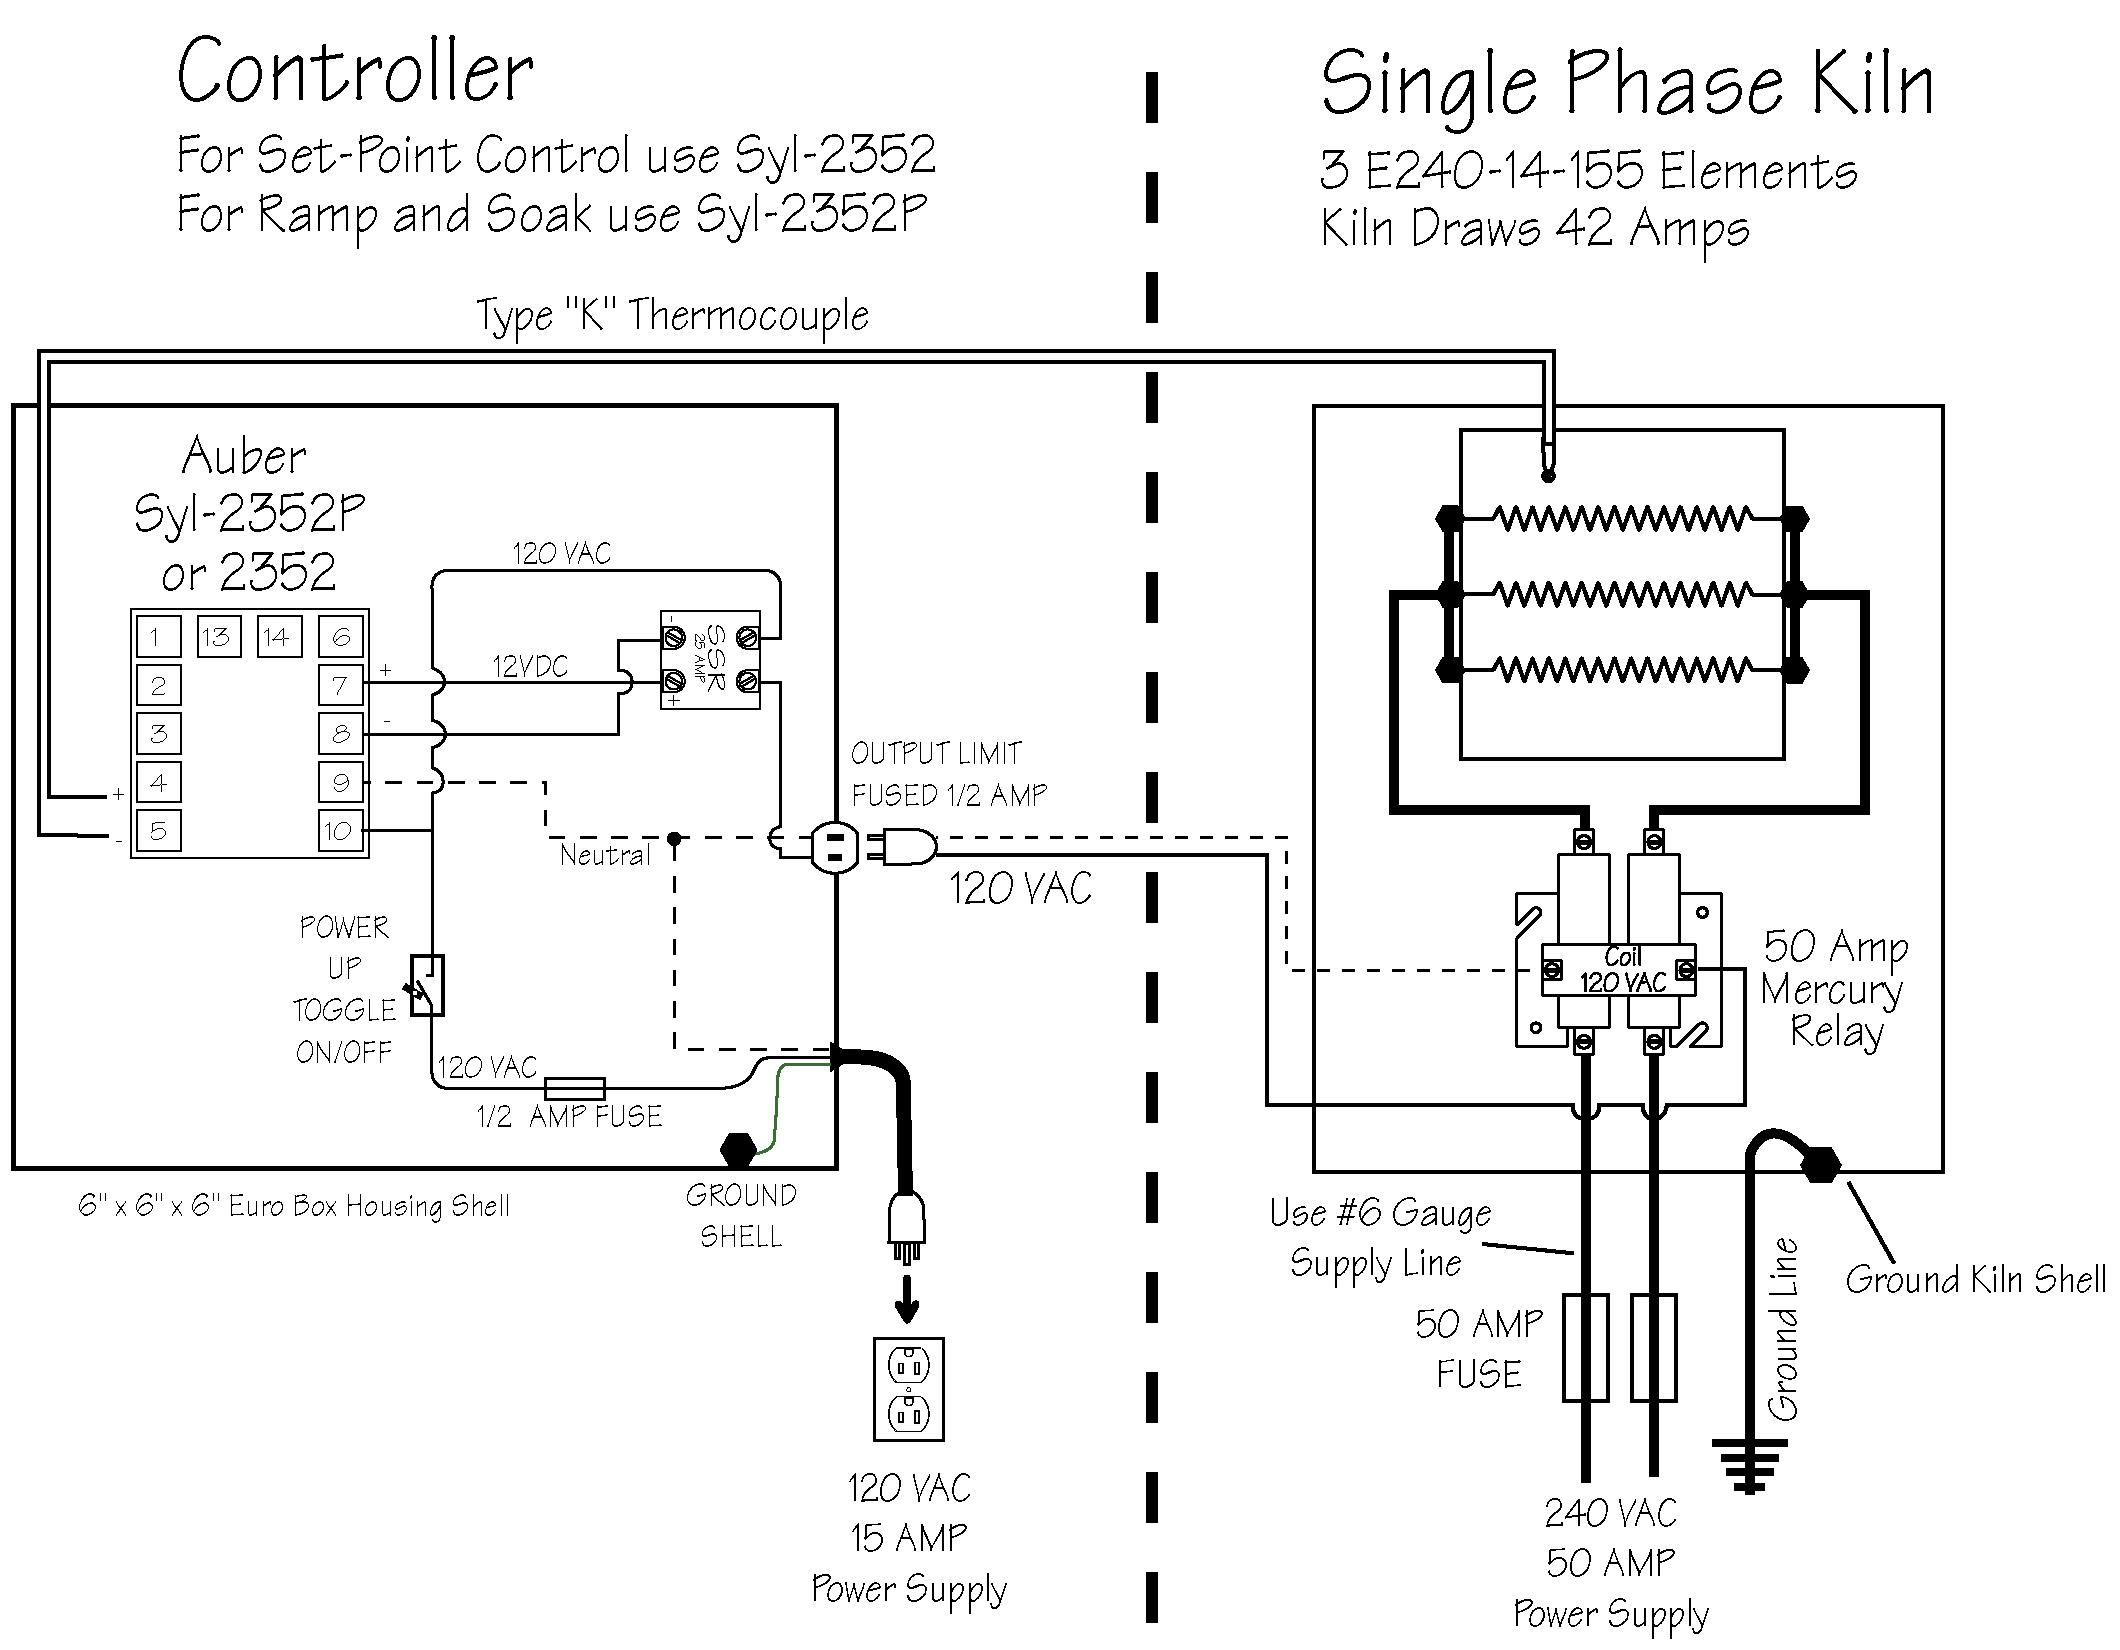 dayton timer relay wiring diagram power inverter furthermore dpdt moreover